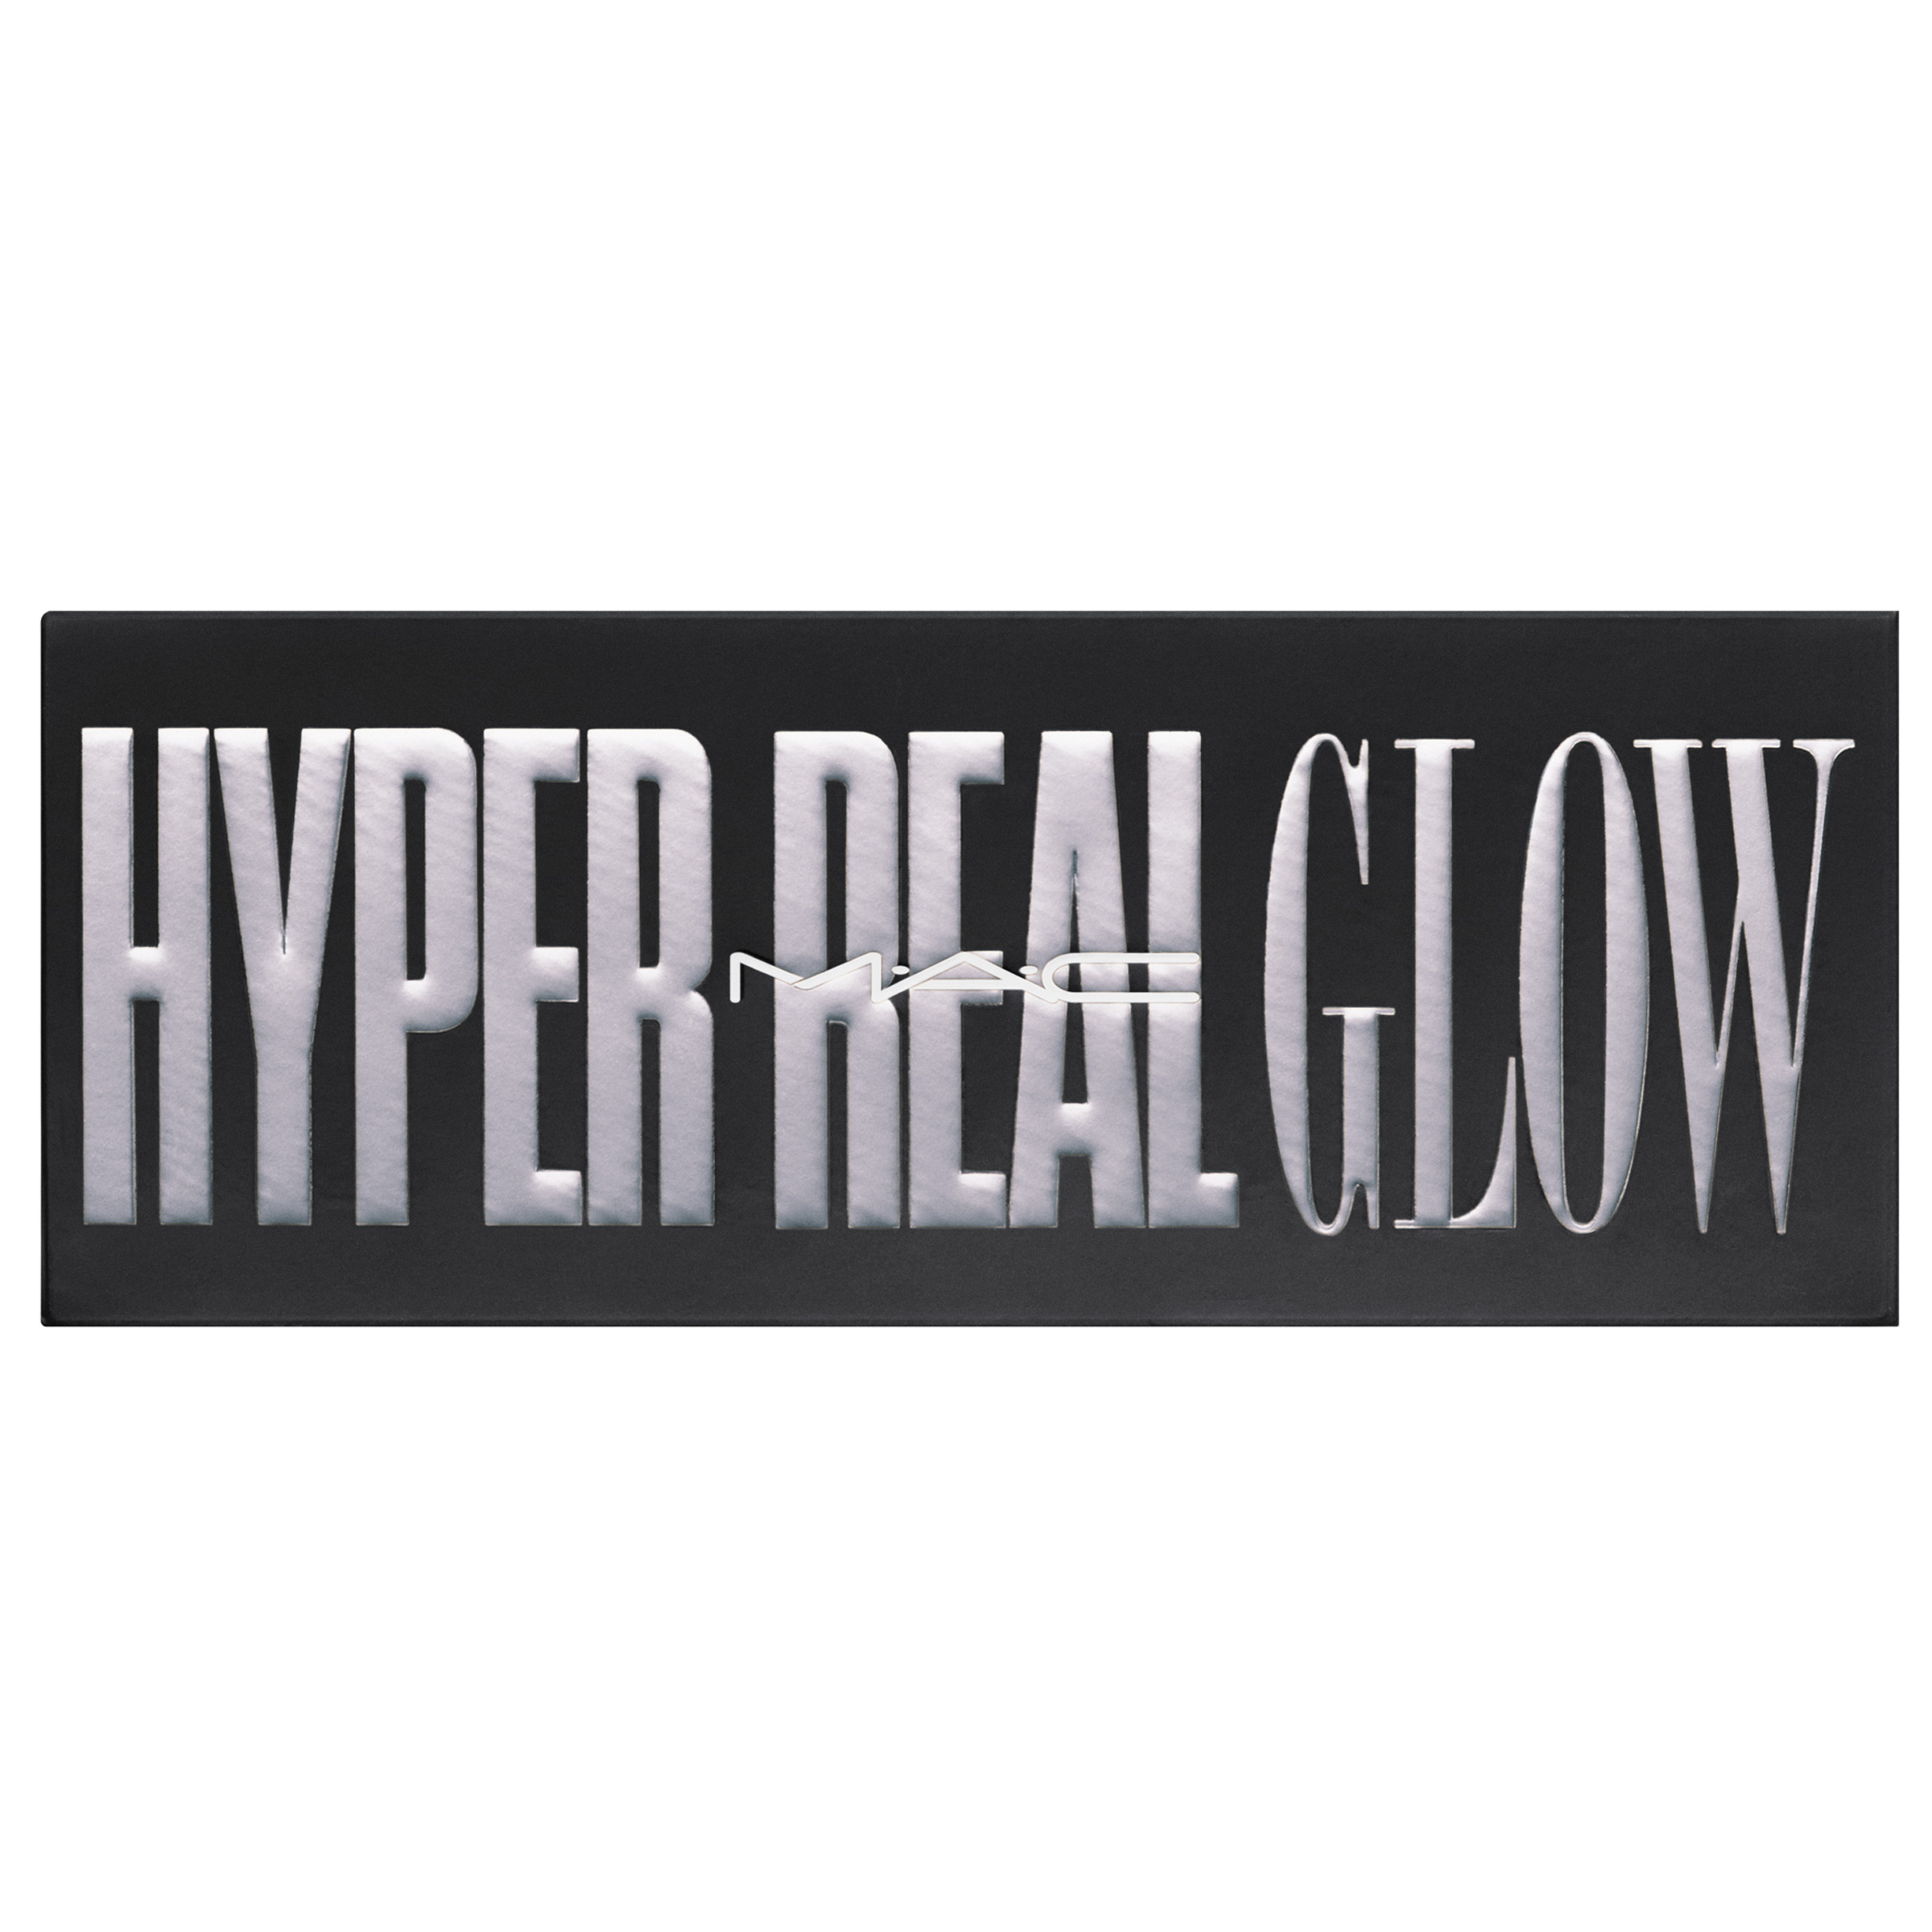 Hyper Real Glow Palette Shimmy Peach GET LIT